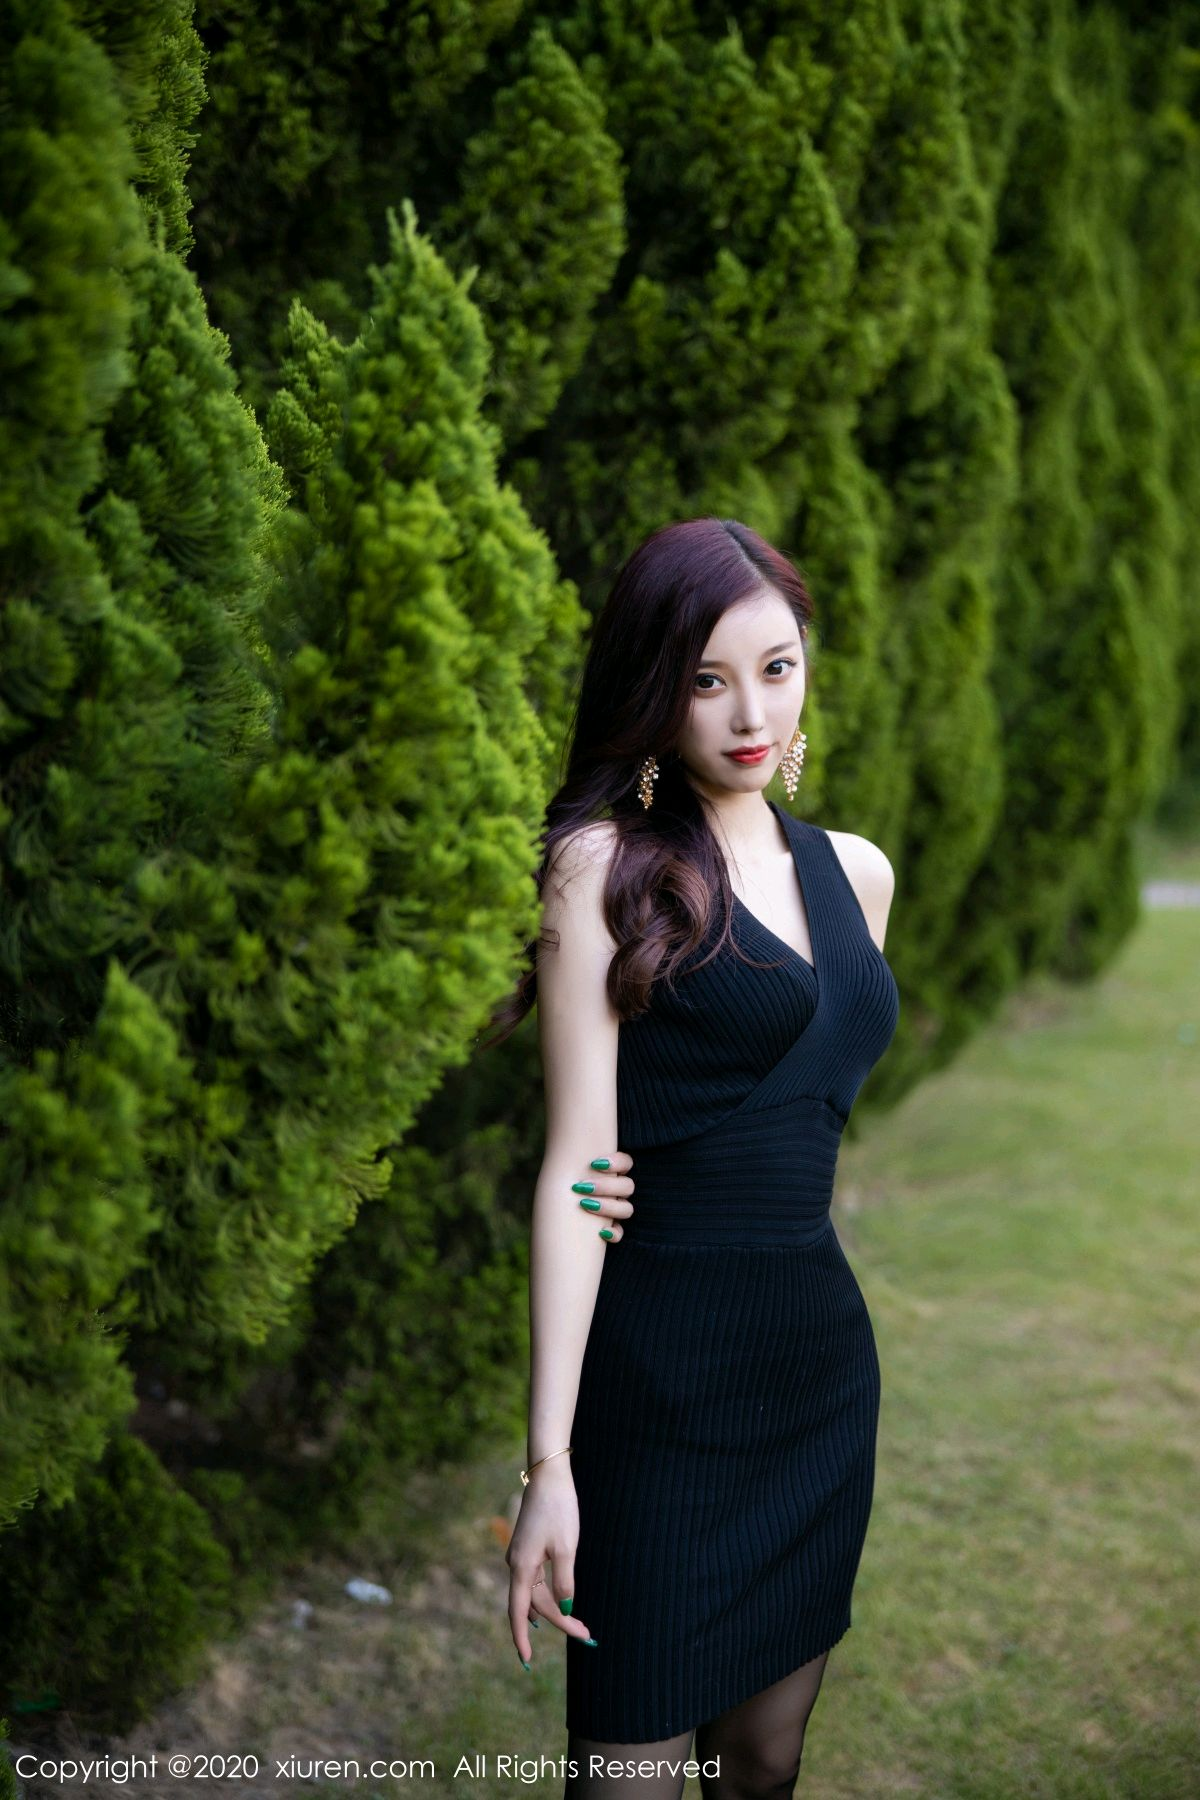 [XiuRen] Vol.2648 Yang Chen Chen 36P, Black Silk, Outdoor, Xiuren, Yang Chen Chen